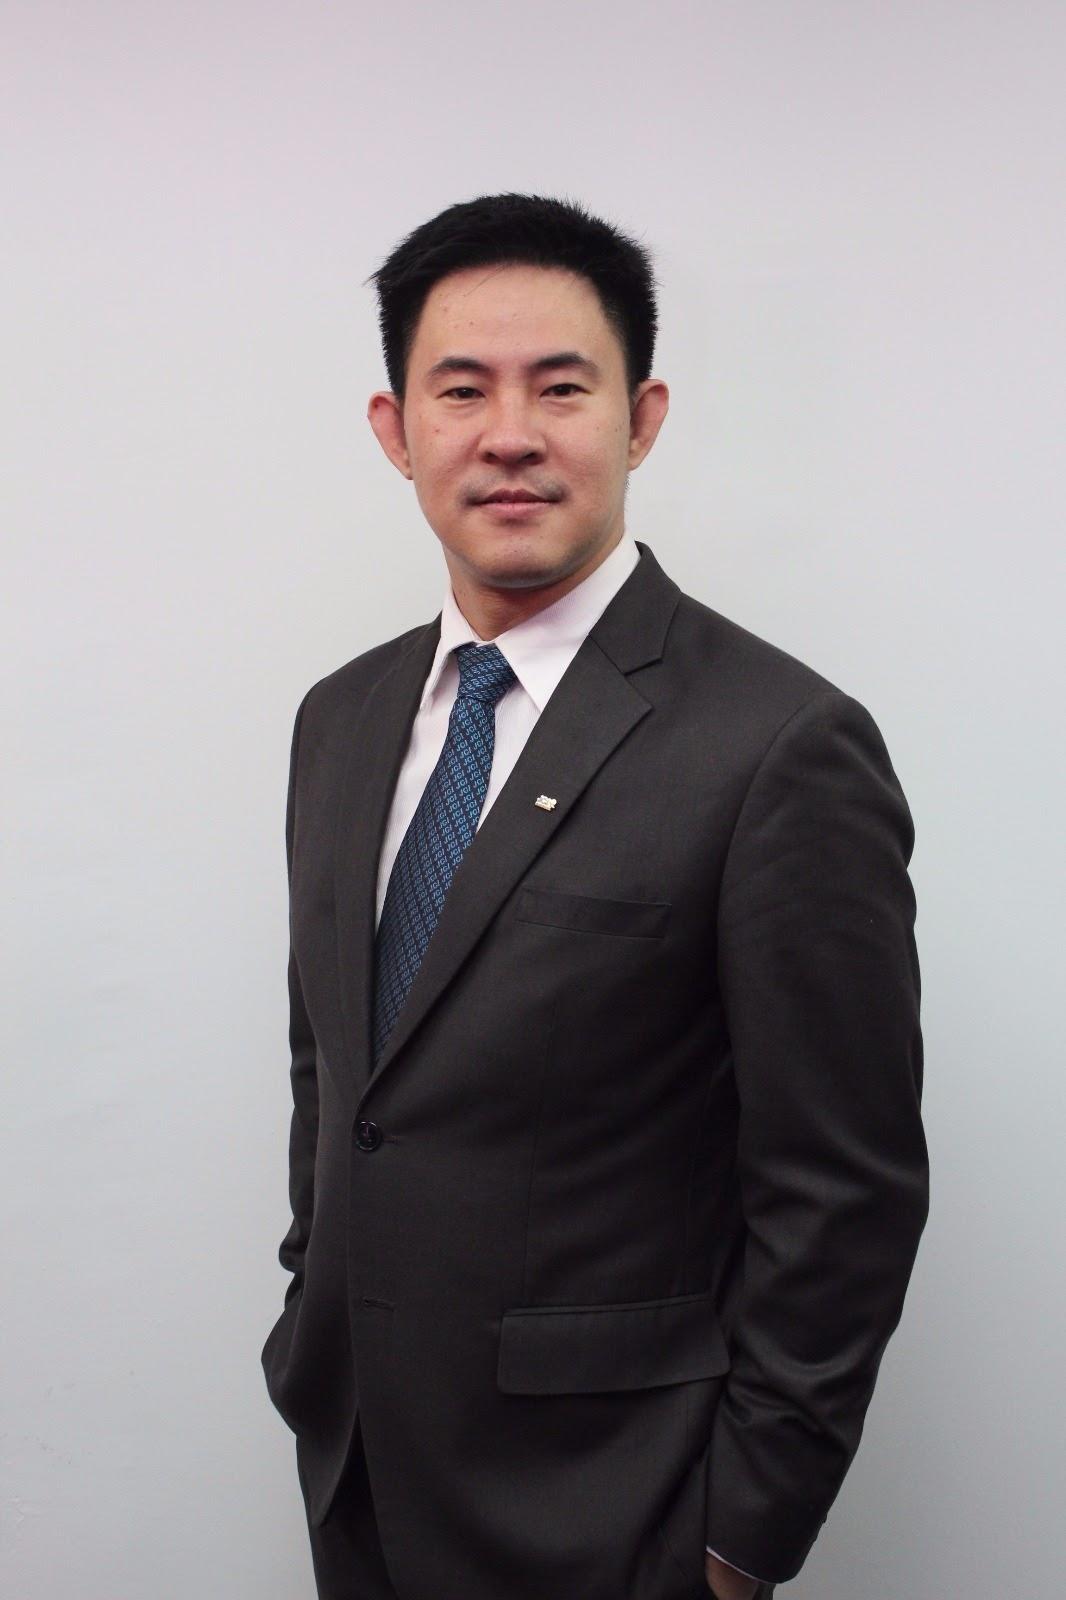 Leong Seng Tat